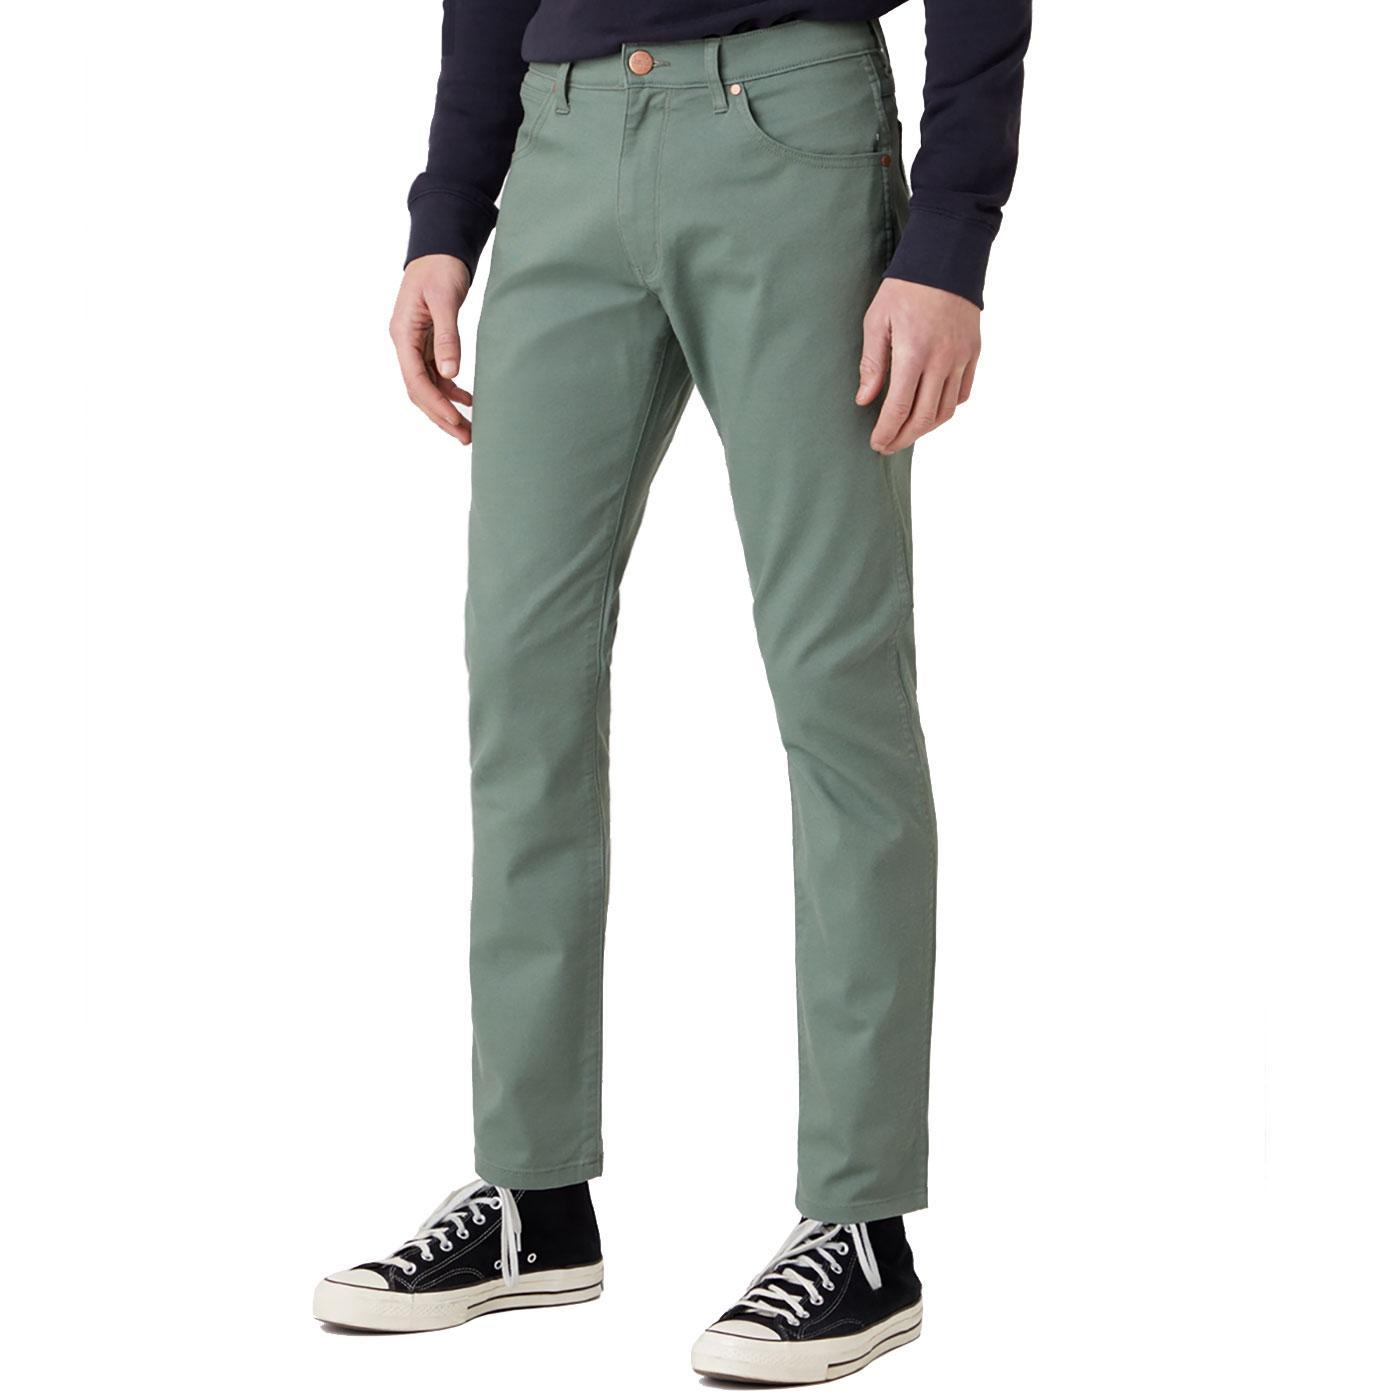 Larston WRANGLER Slim Tapered Non-Denim Jeans WG